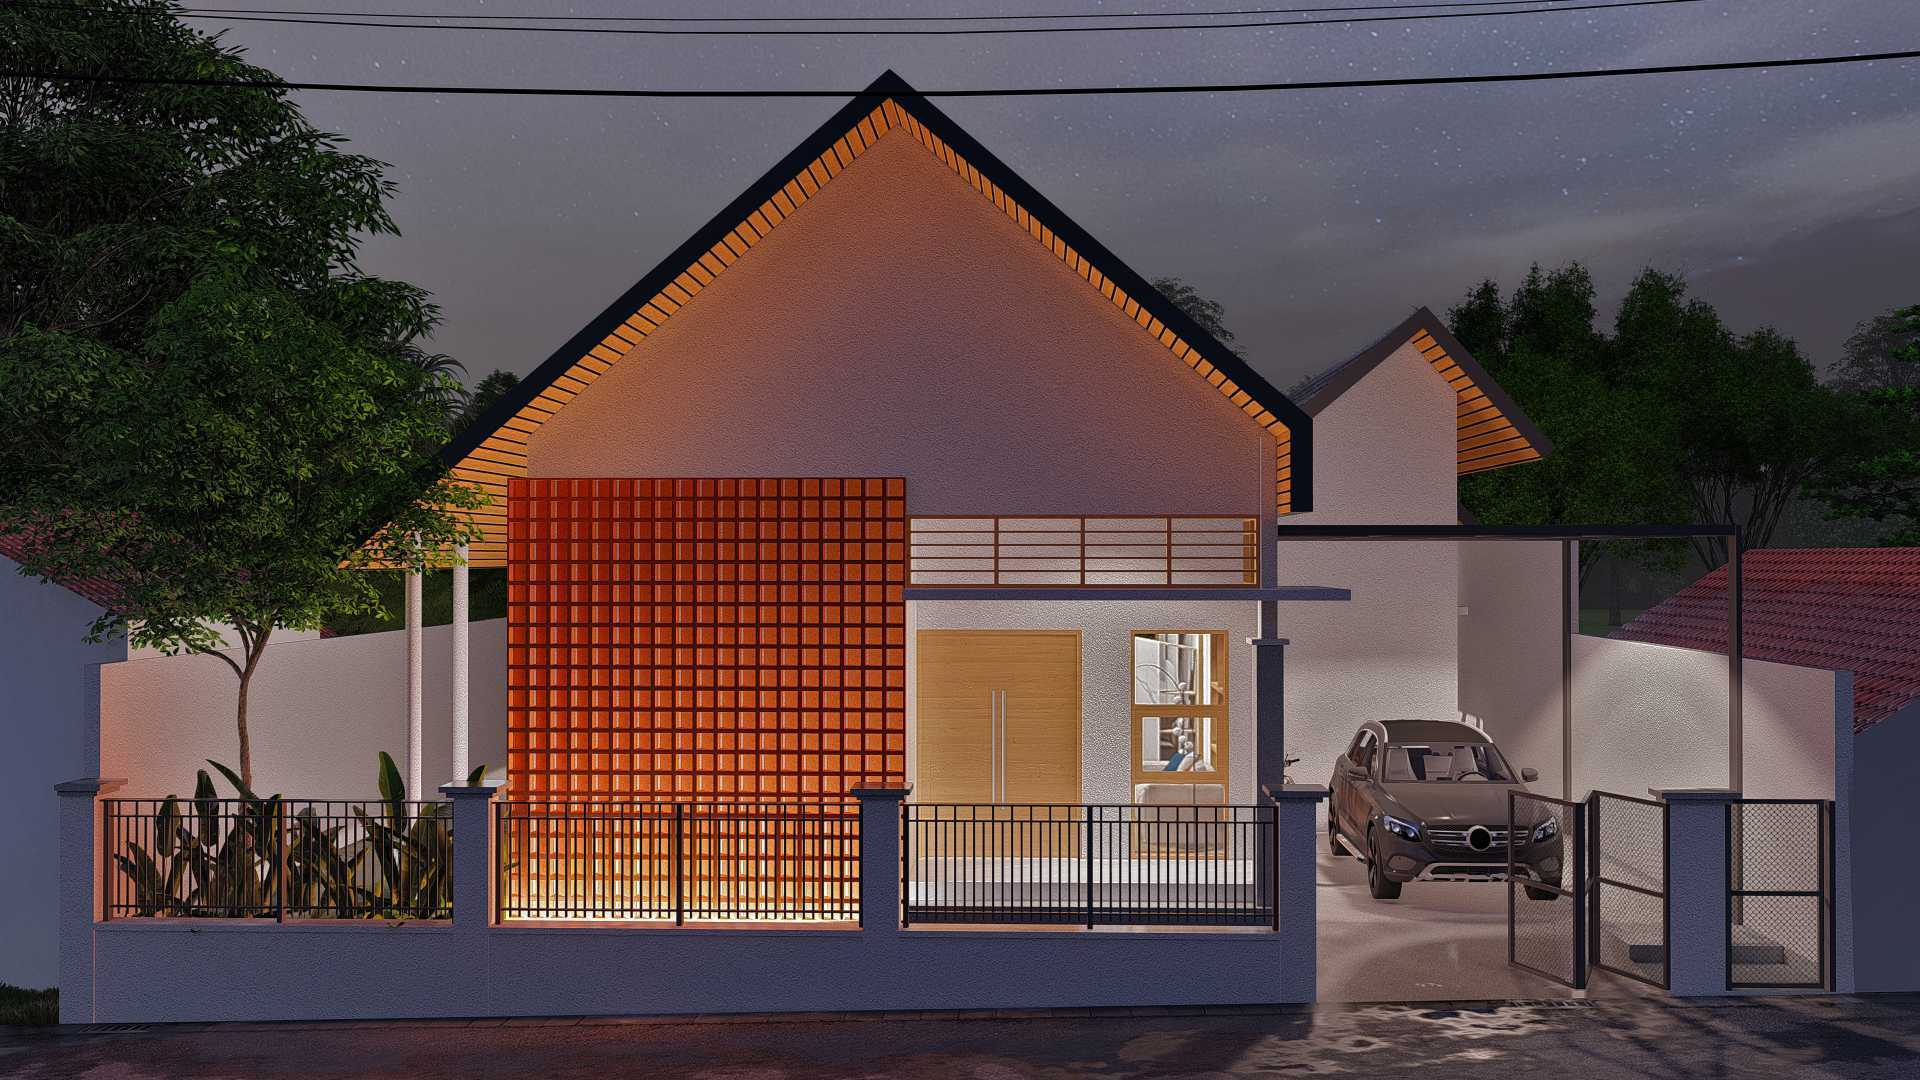 Jasa Arsitek San+ Architect di Sleman